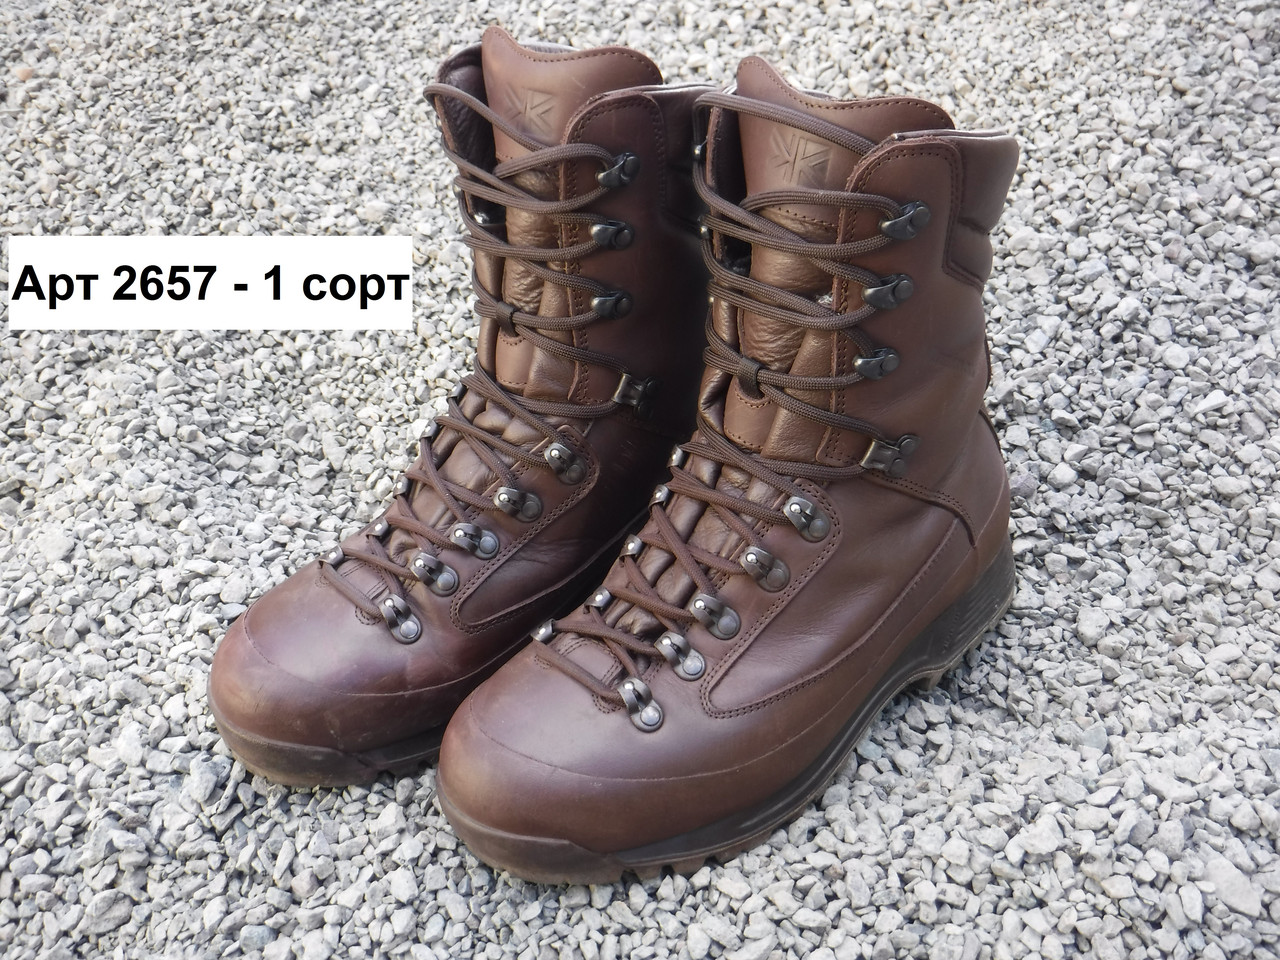 Ботинки KARRIMOR  Combat Cold Wet Weather Boots оригинал Б/У 1 сорт